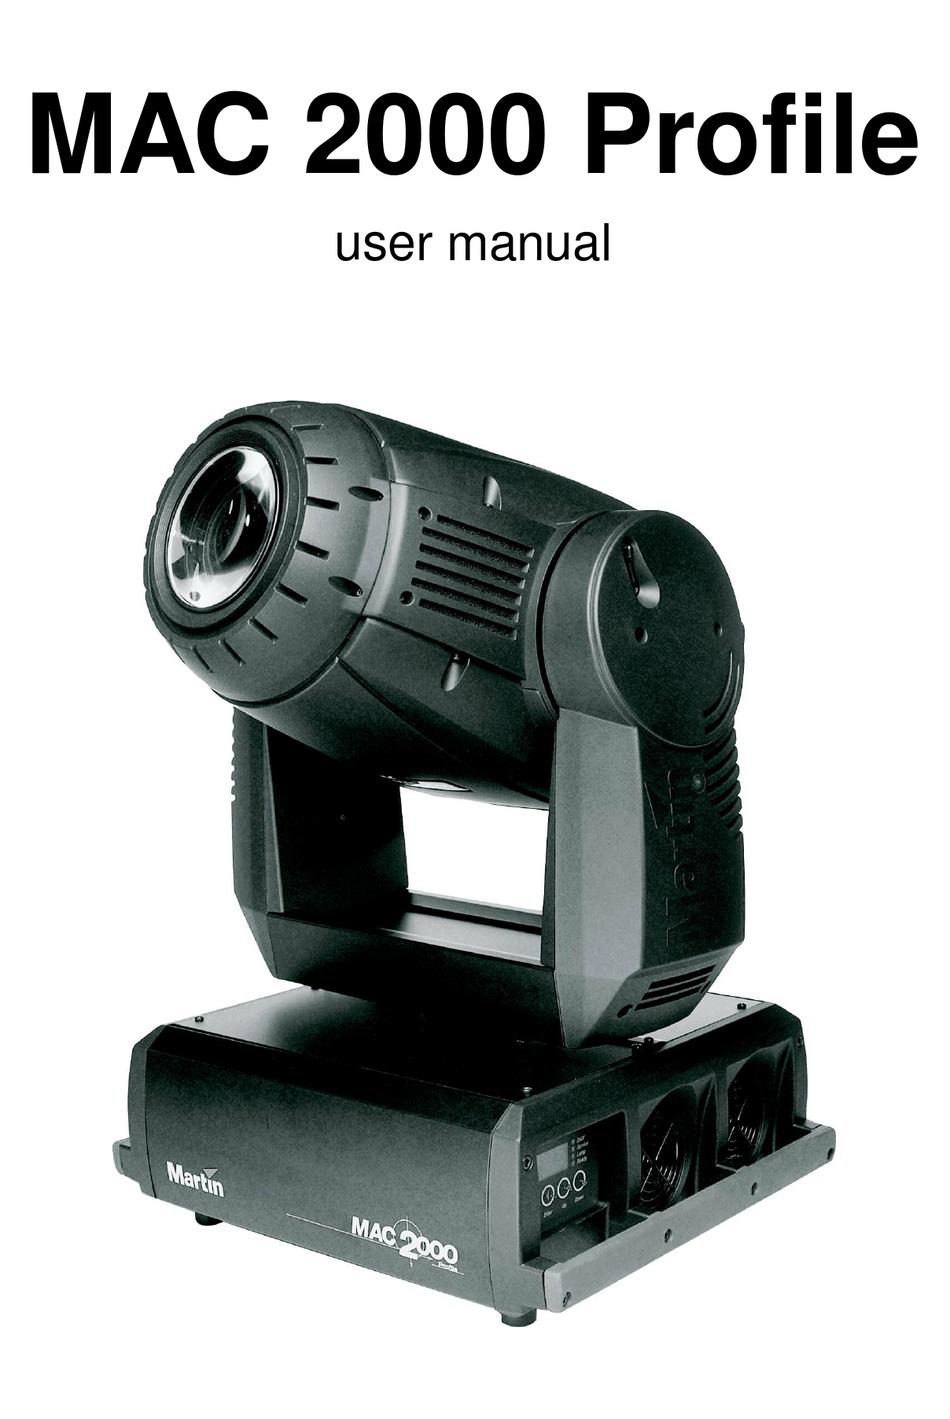 Mac 2000 profile manual